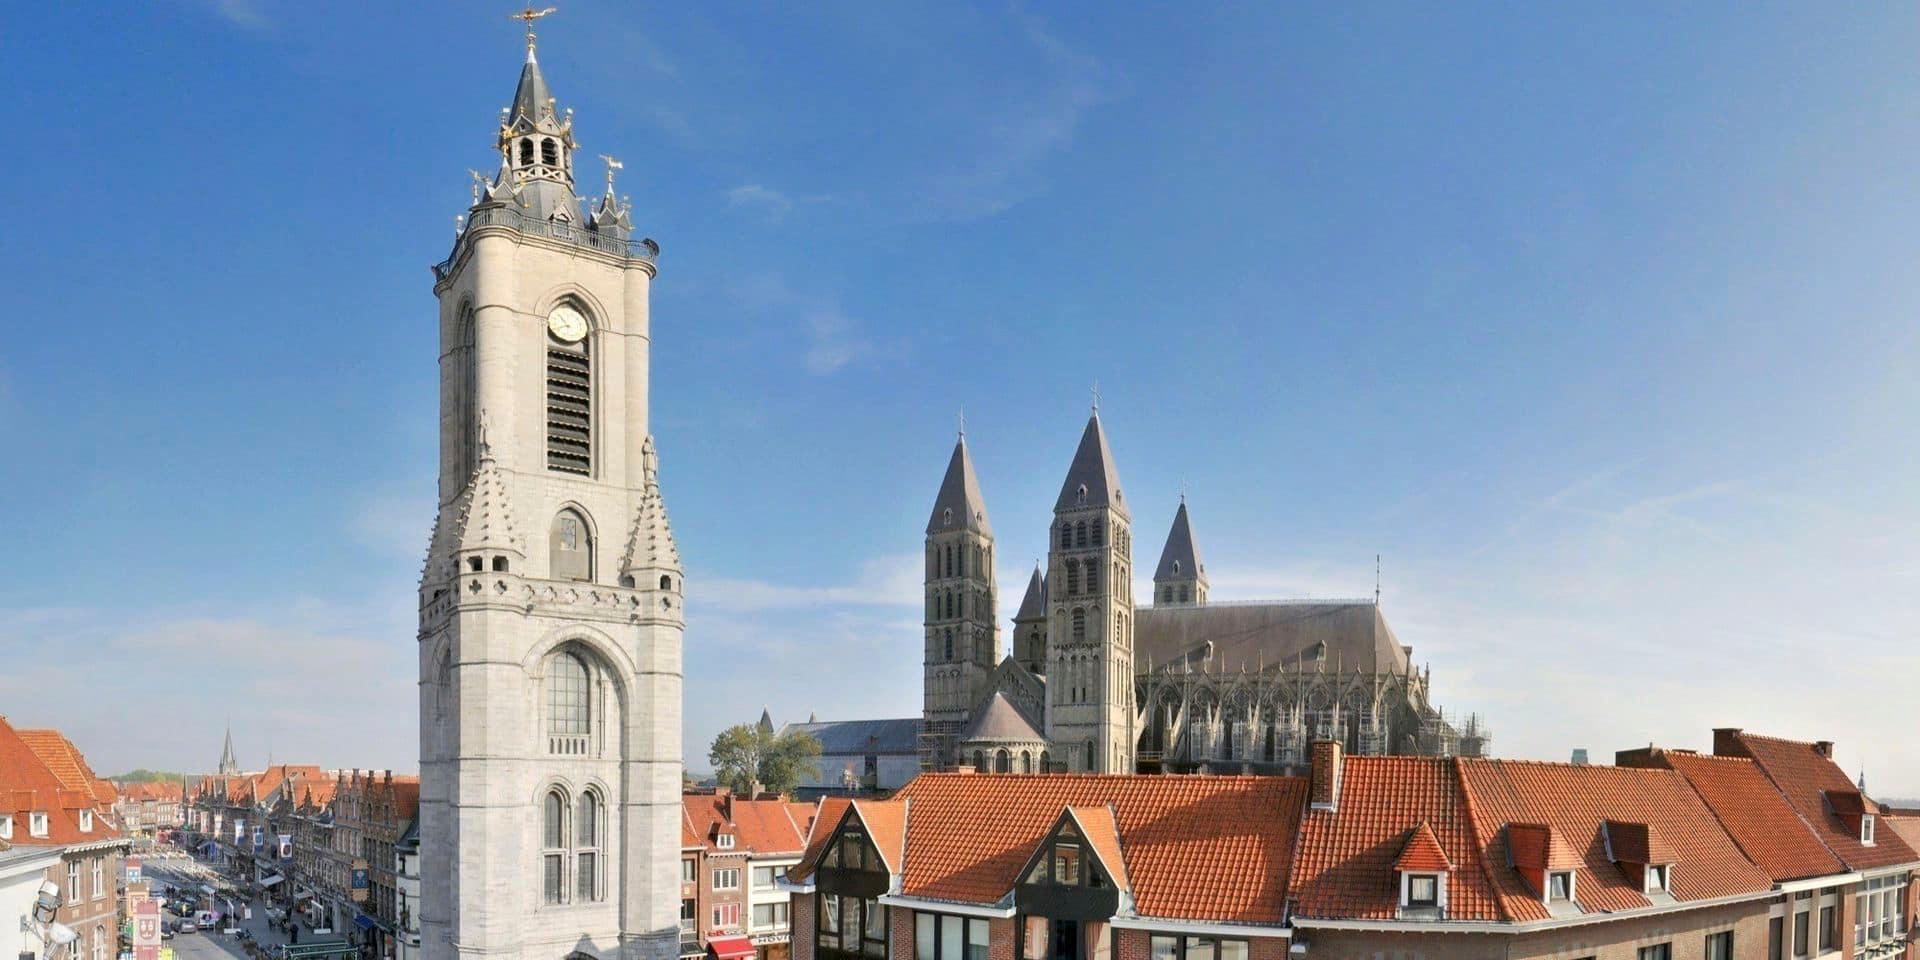 Le Beffroi de Tournai toujours inaccessible